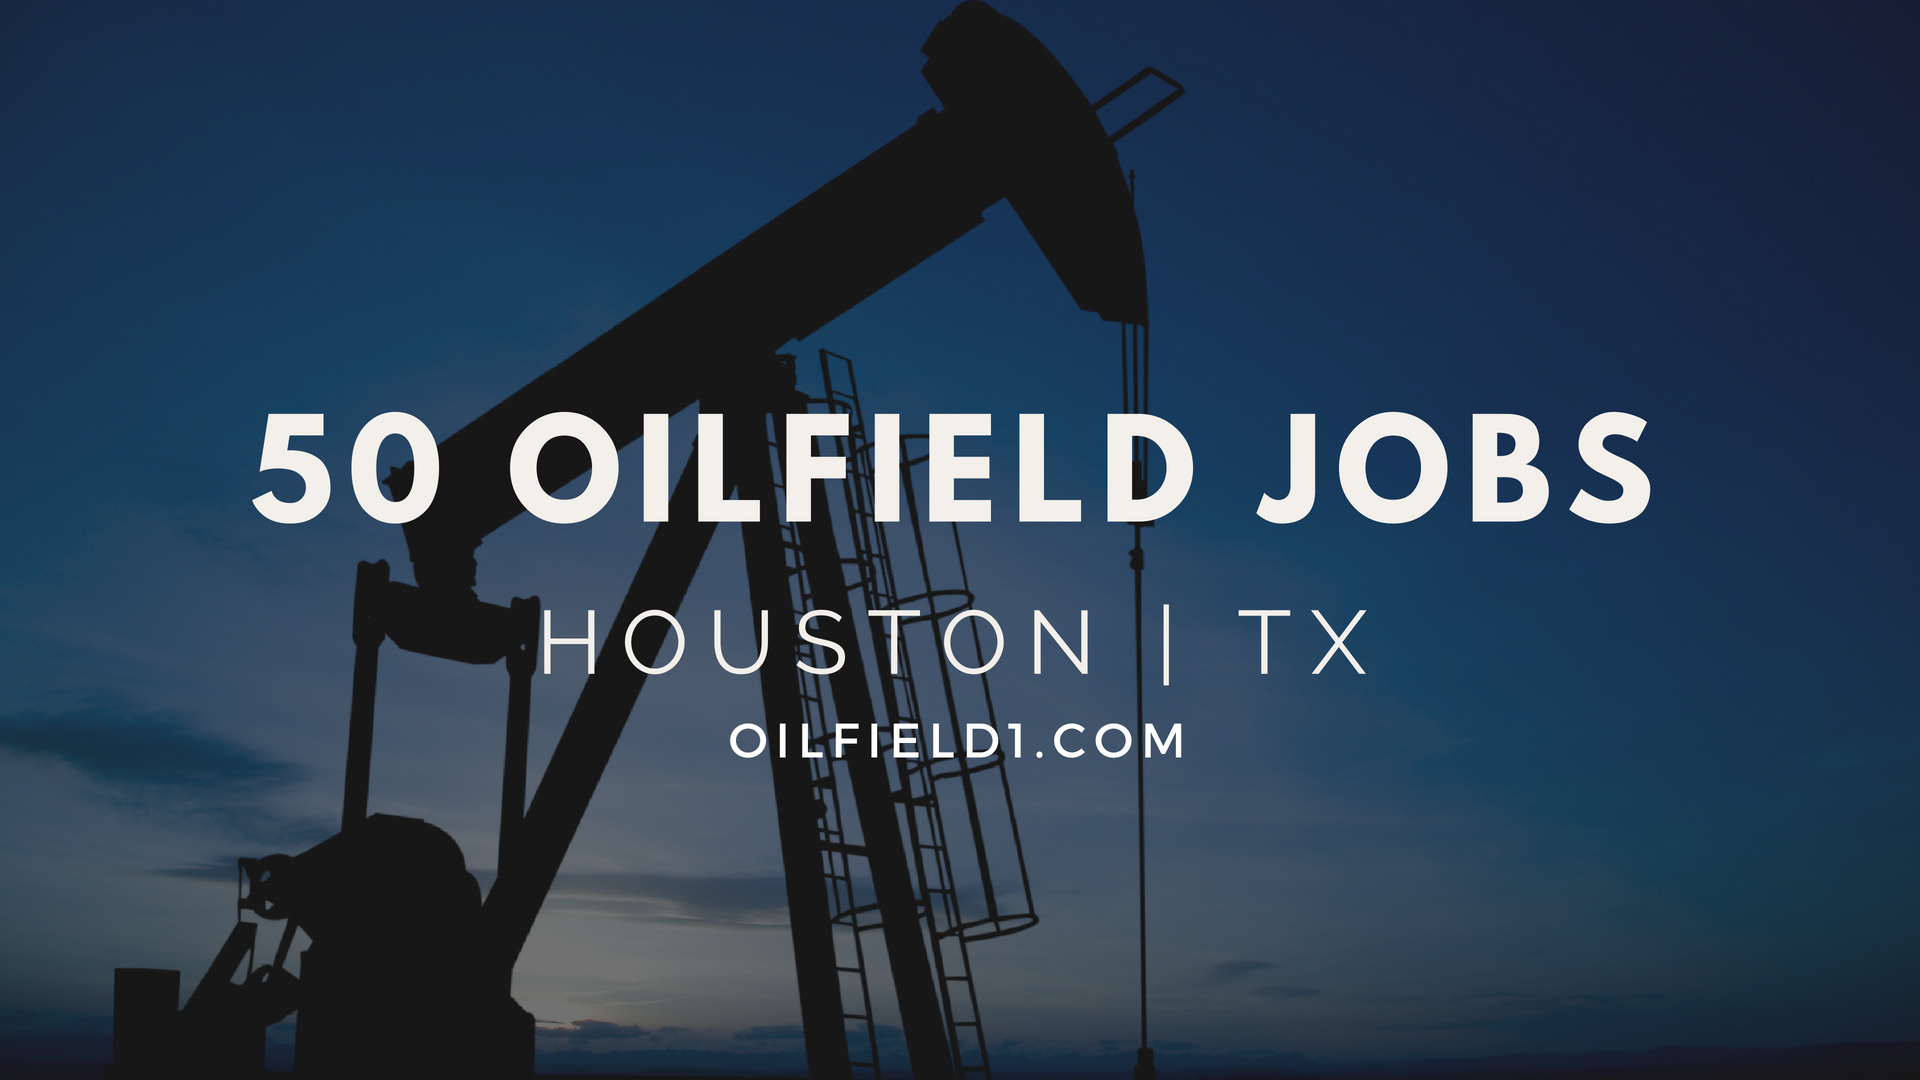 50 Oilfield Jobs Now Houston Tx Oilfield1